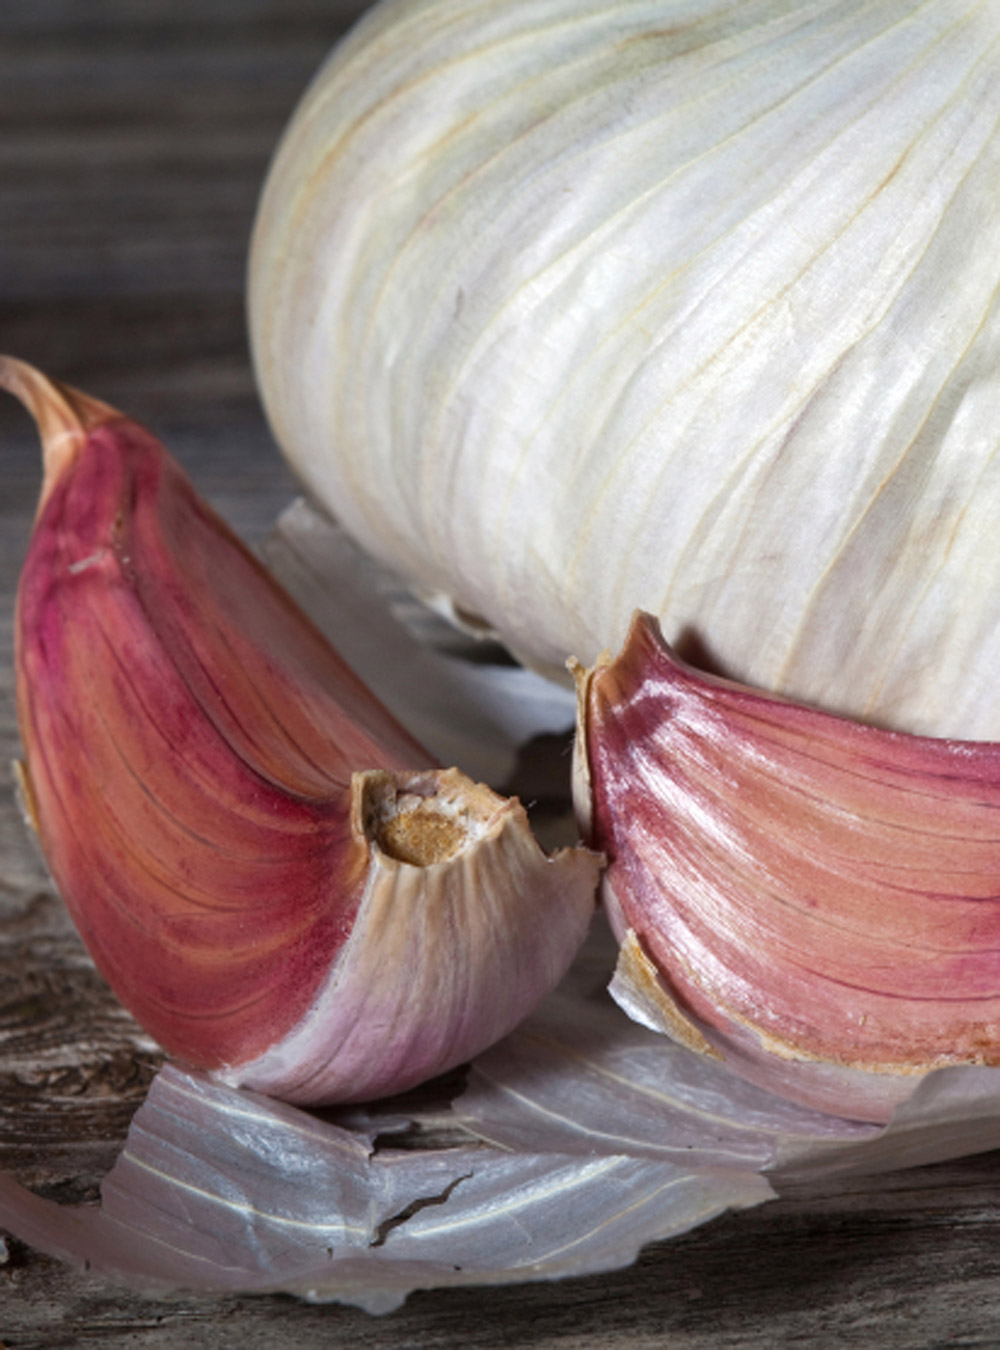 Broccoli and Roasted Garlic Puree